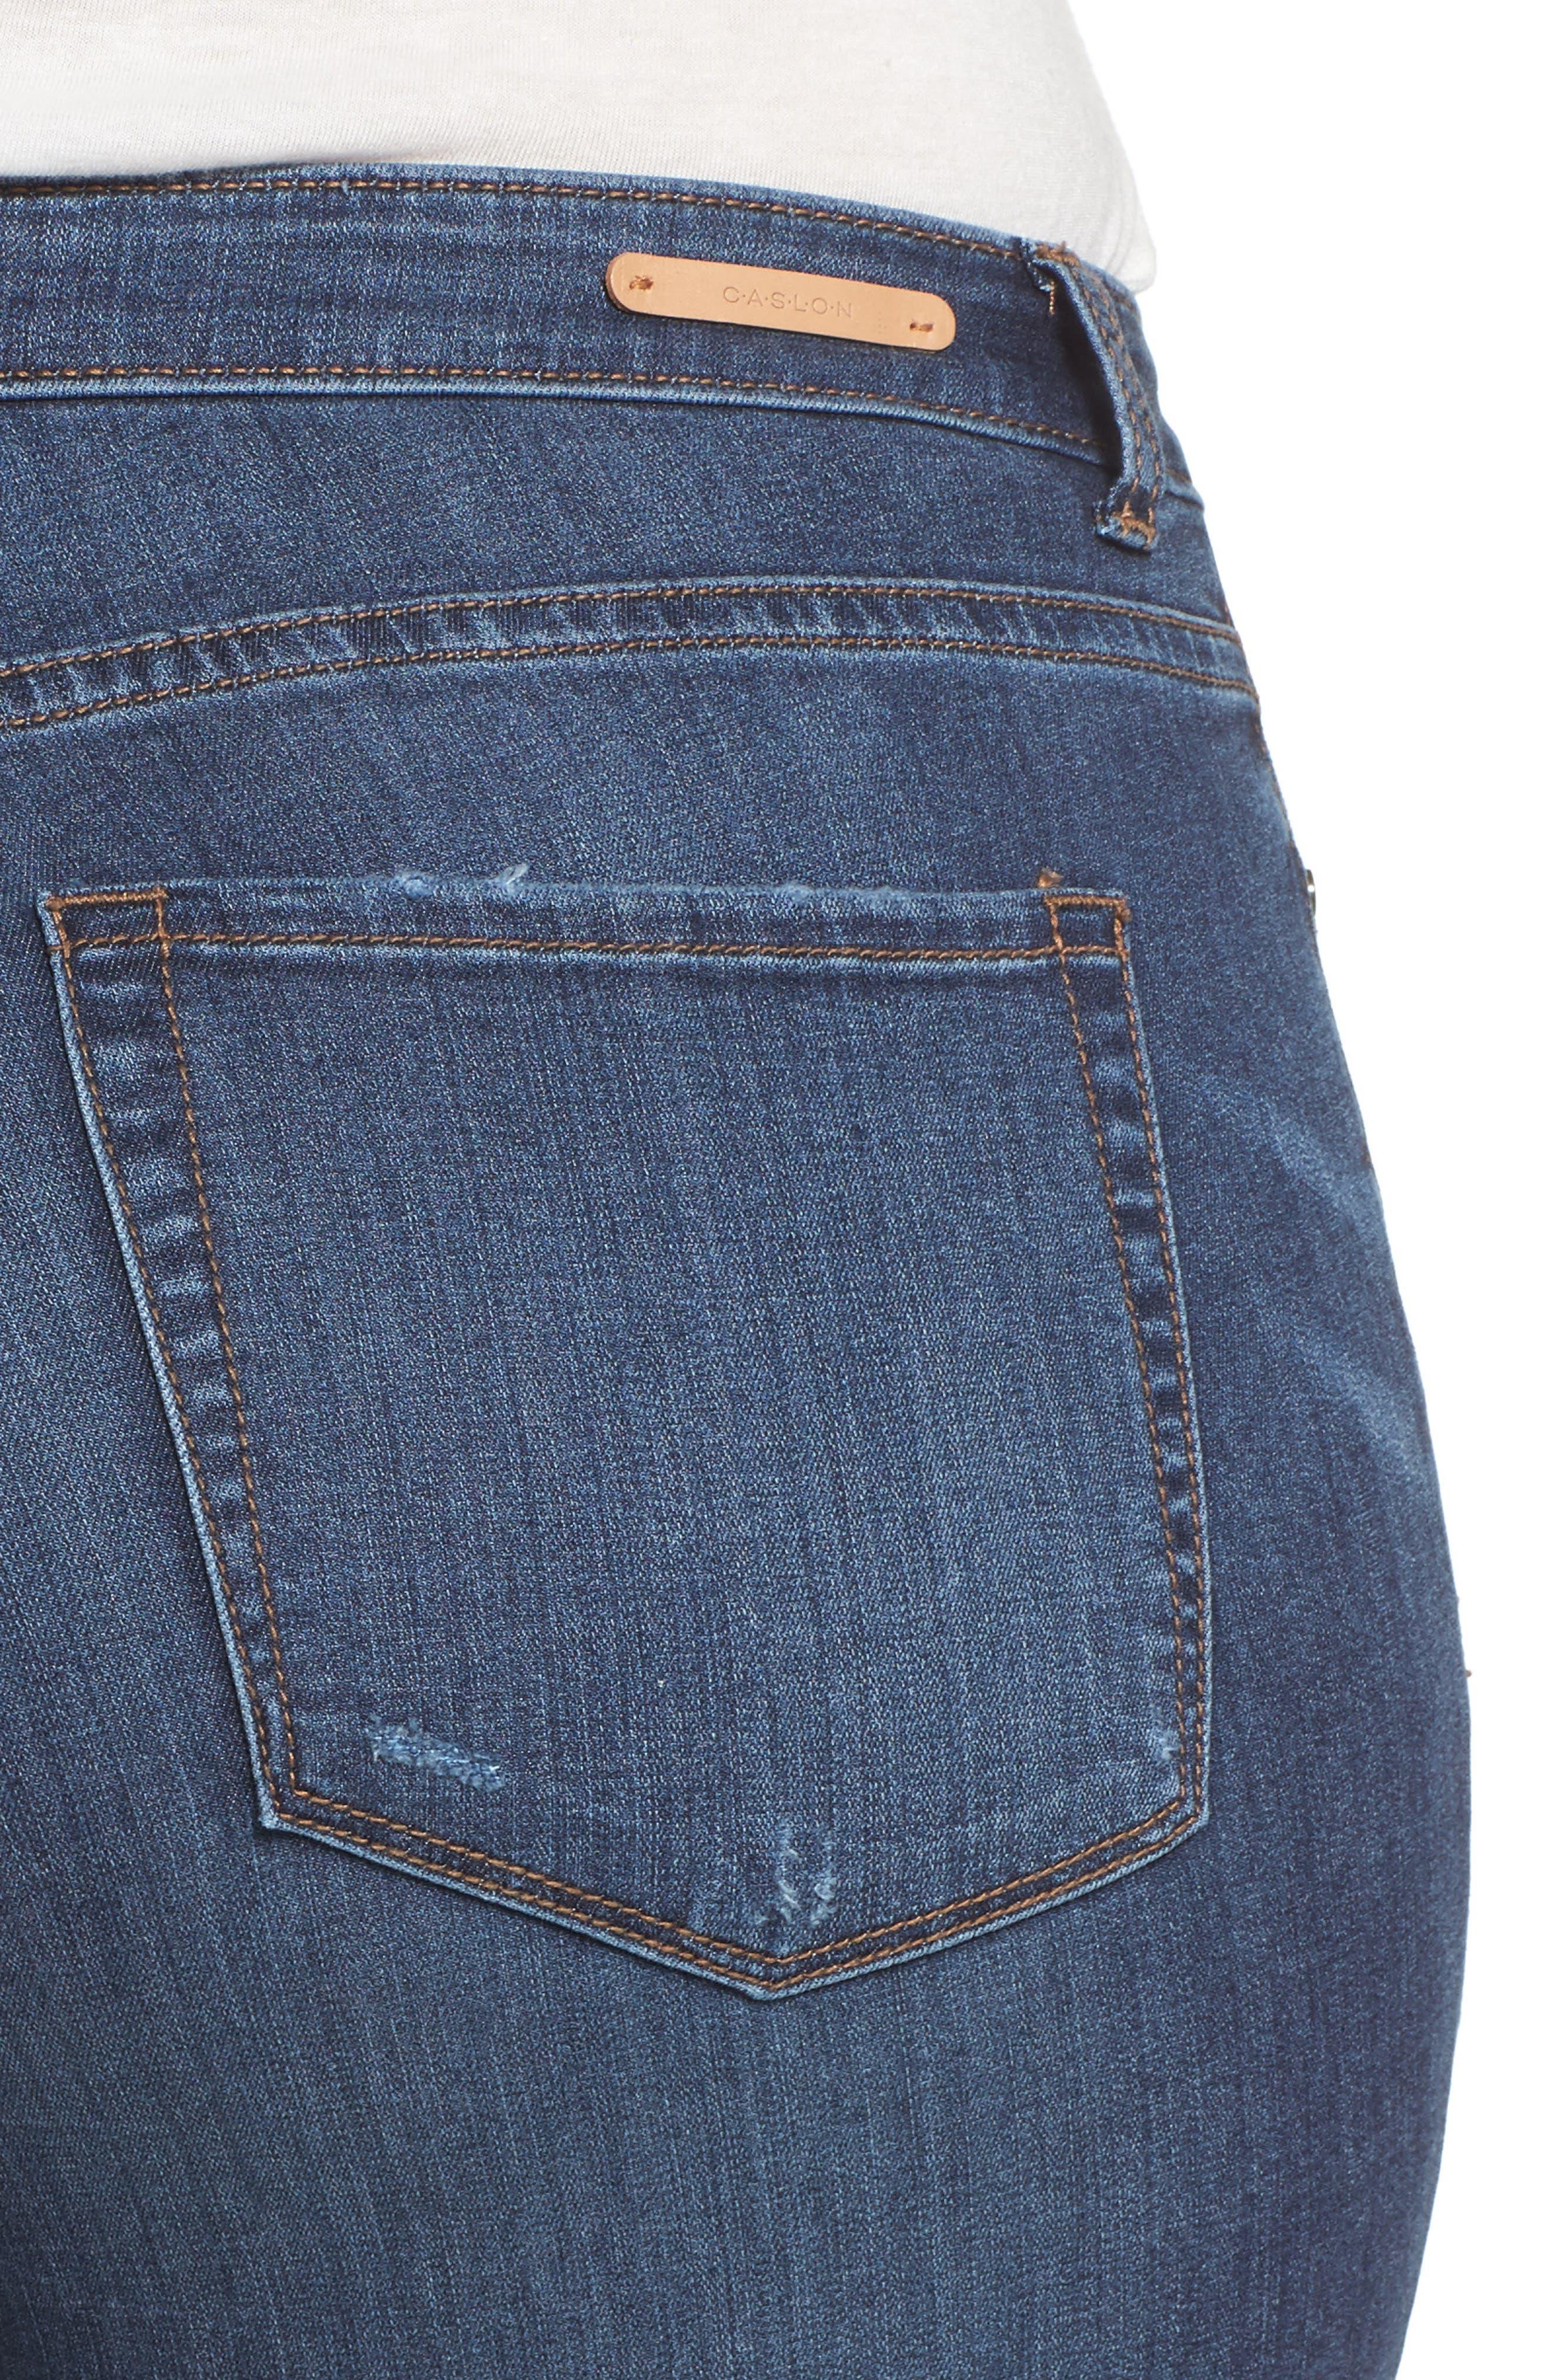 Rip Repair Skinny Jeans,                             Alternate thumbnail 5, color,                             Blue Octavia Wash